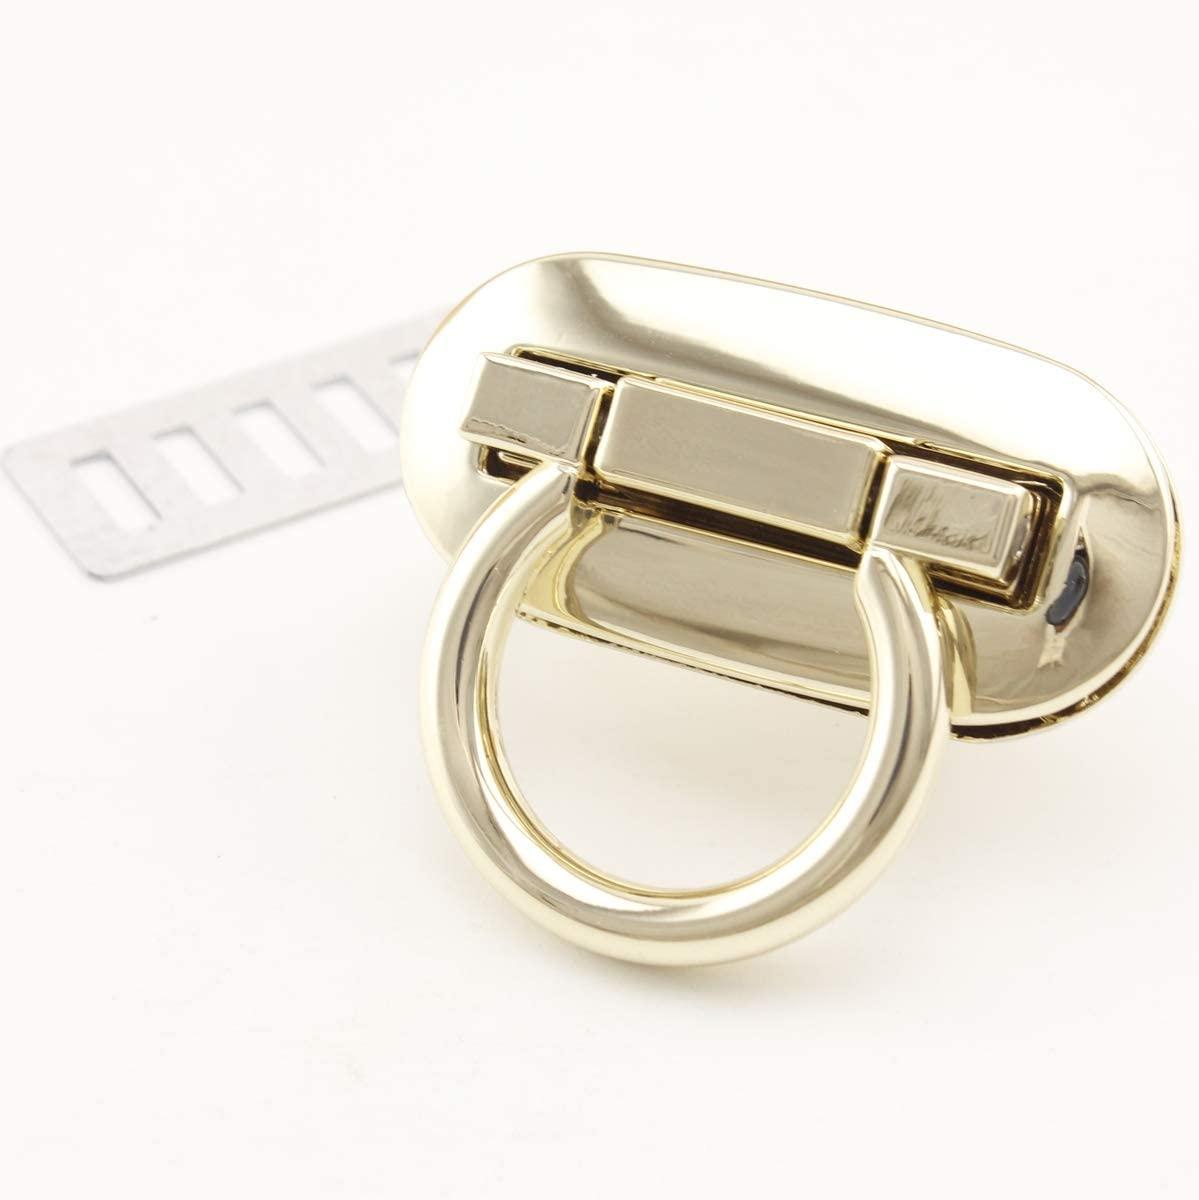 4.2cm x 2.1cm Oval Shape Zinc Alloy Turn Lock Purse Lock for Handbag Purse Bag Making 1 Set per lot Light Gold N73